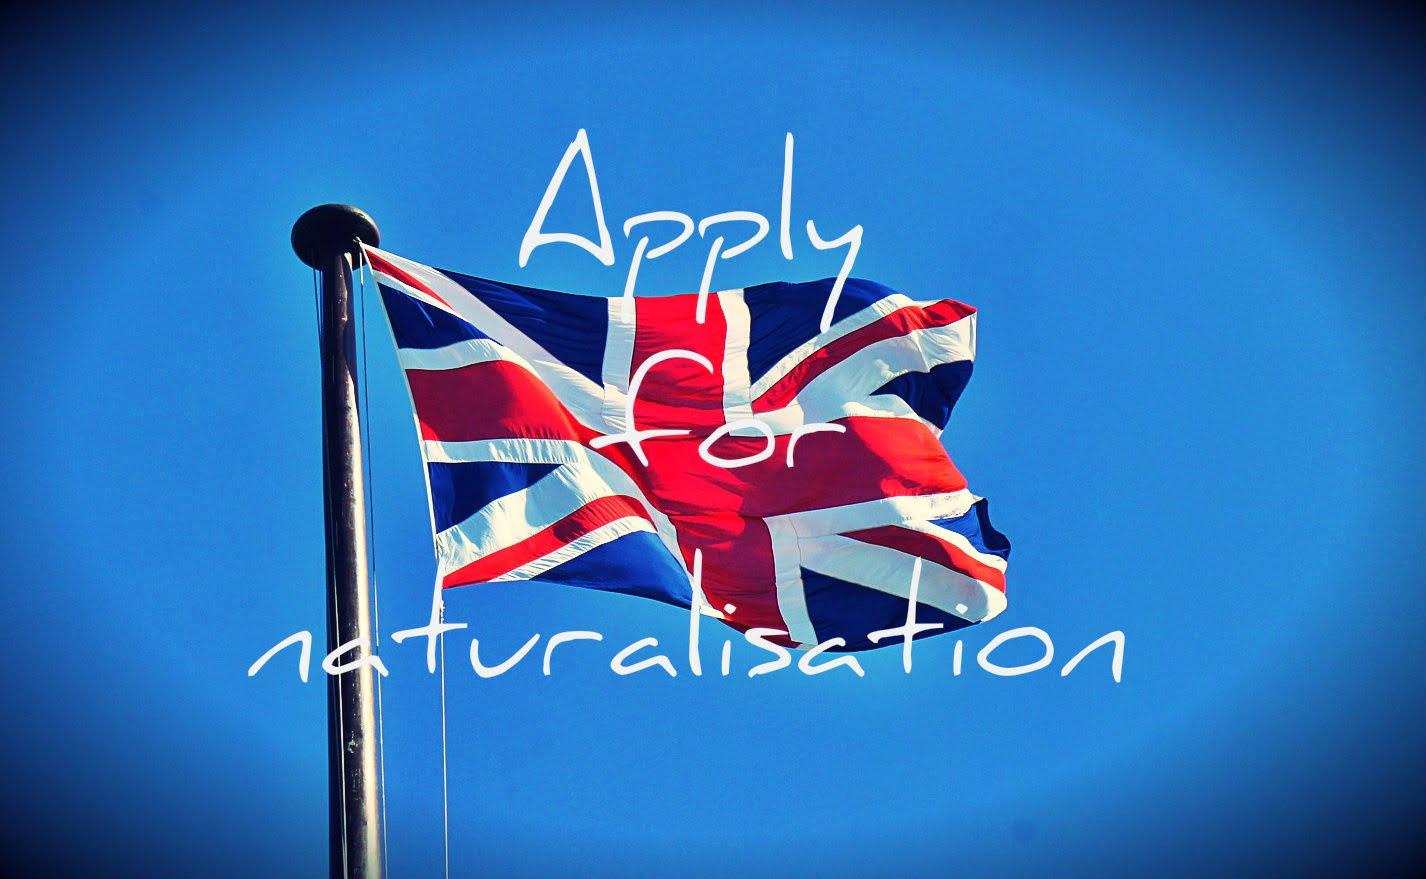 naturalisation-eea-nationals-brexit-immigration-advice-lexvisa